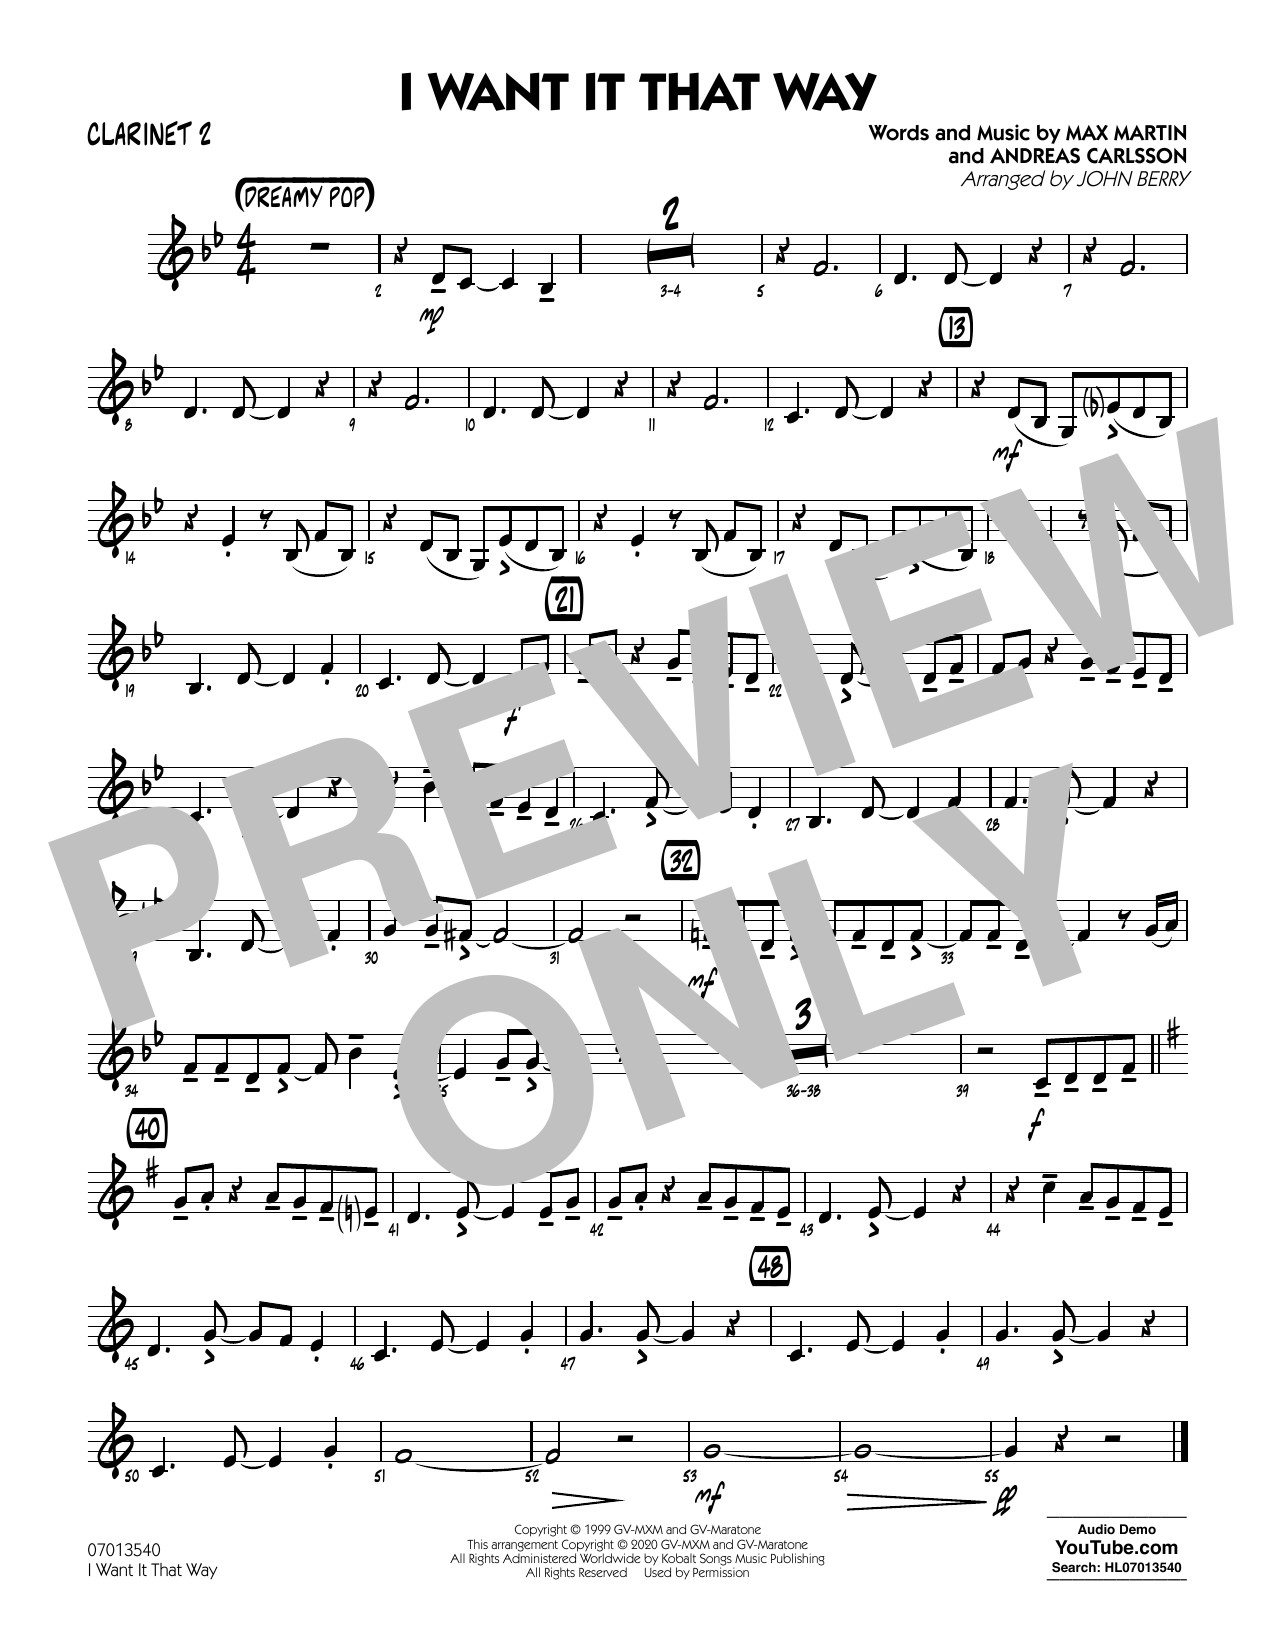 I Want It That Way (arr. John Berry) - Clarinet 2 Sheet Music